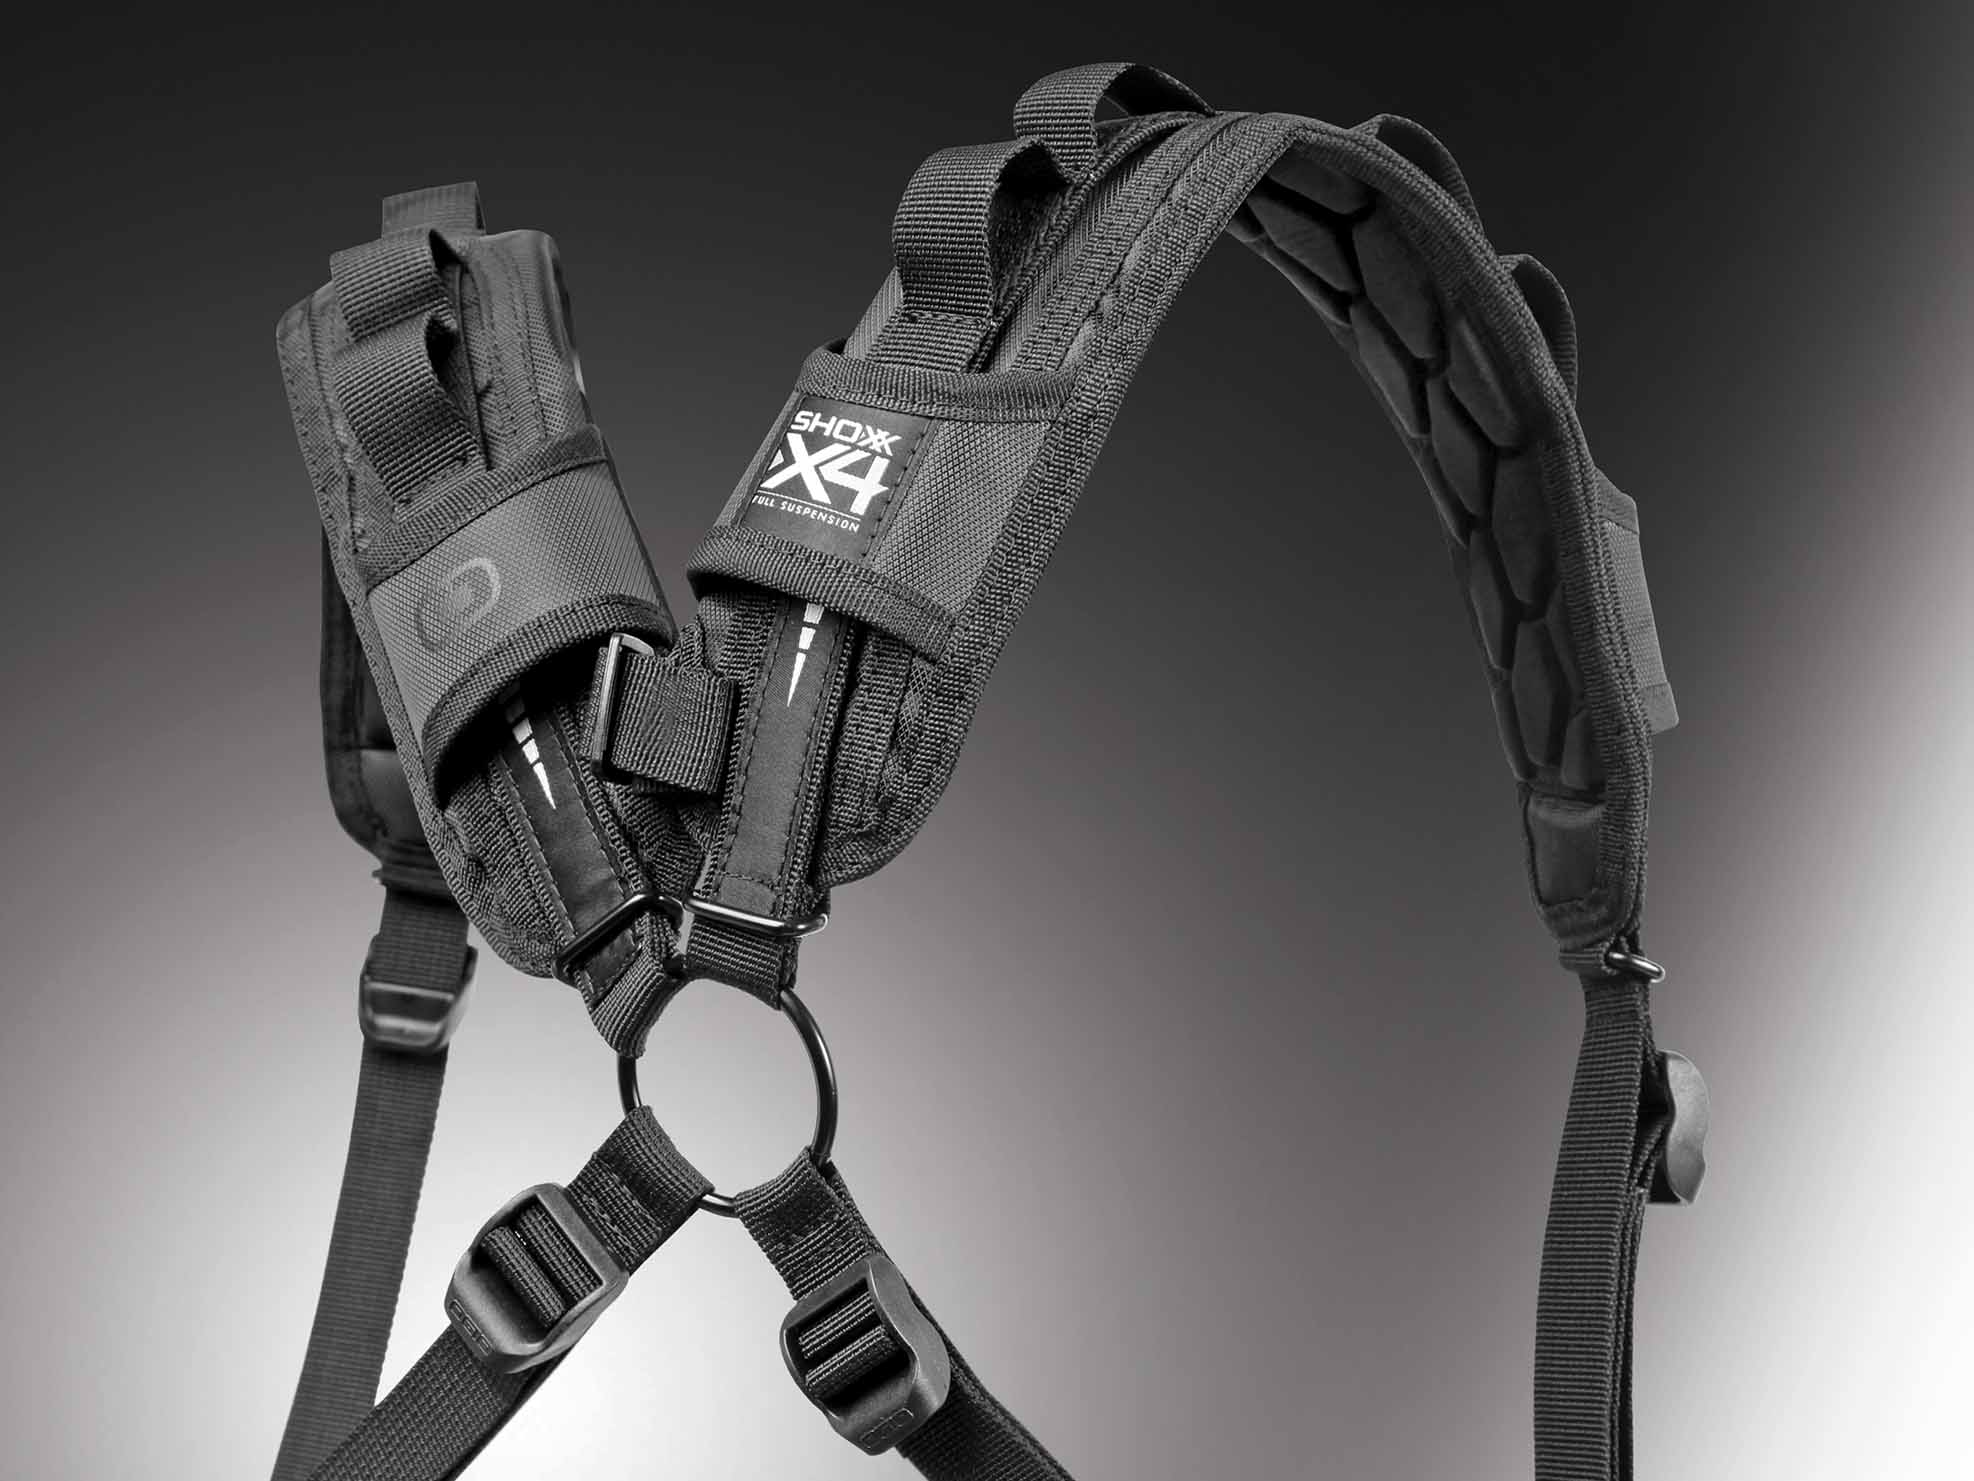 X4 shoxx straps